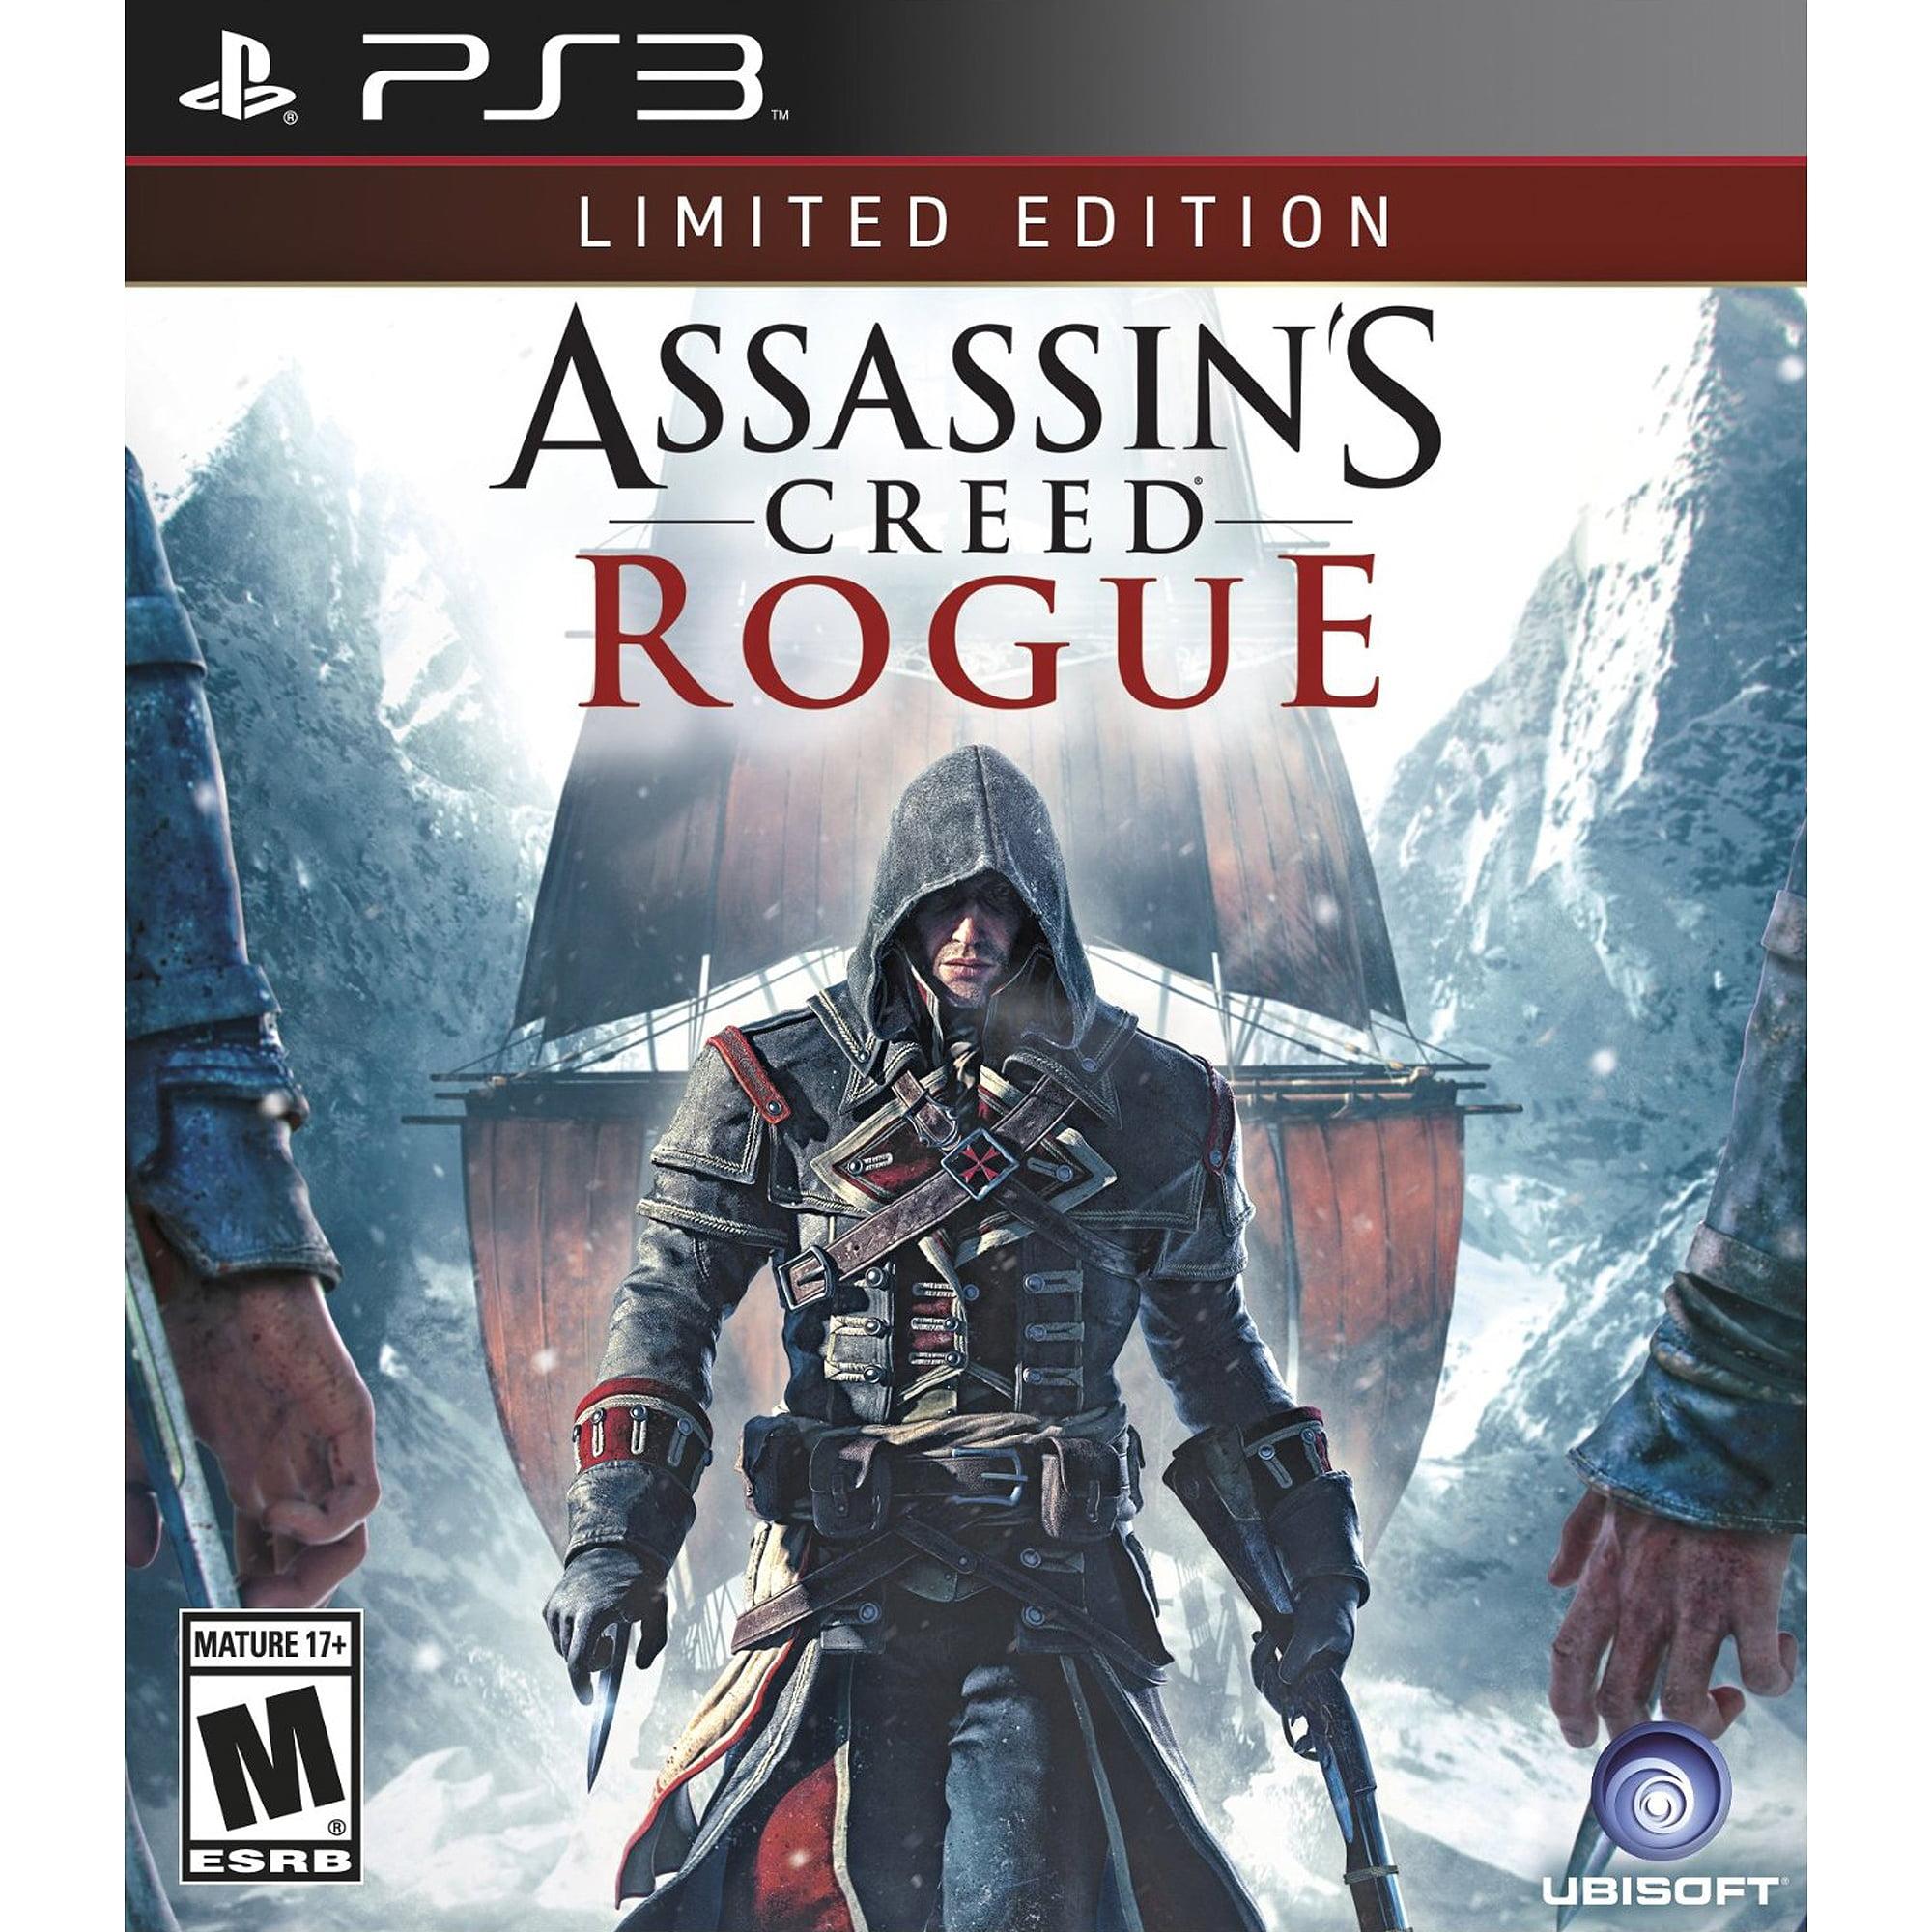 Assassin's Creed: Rogue (PS3)